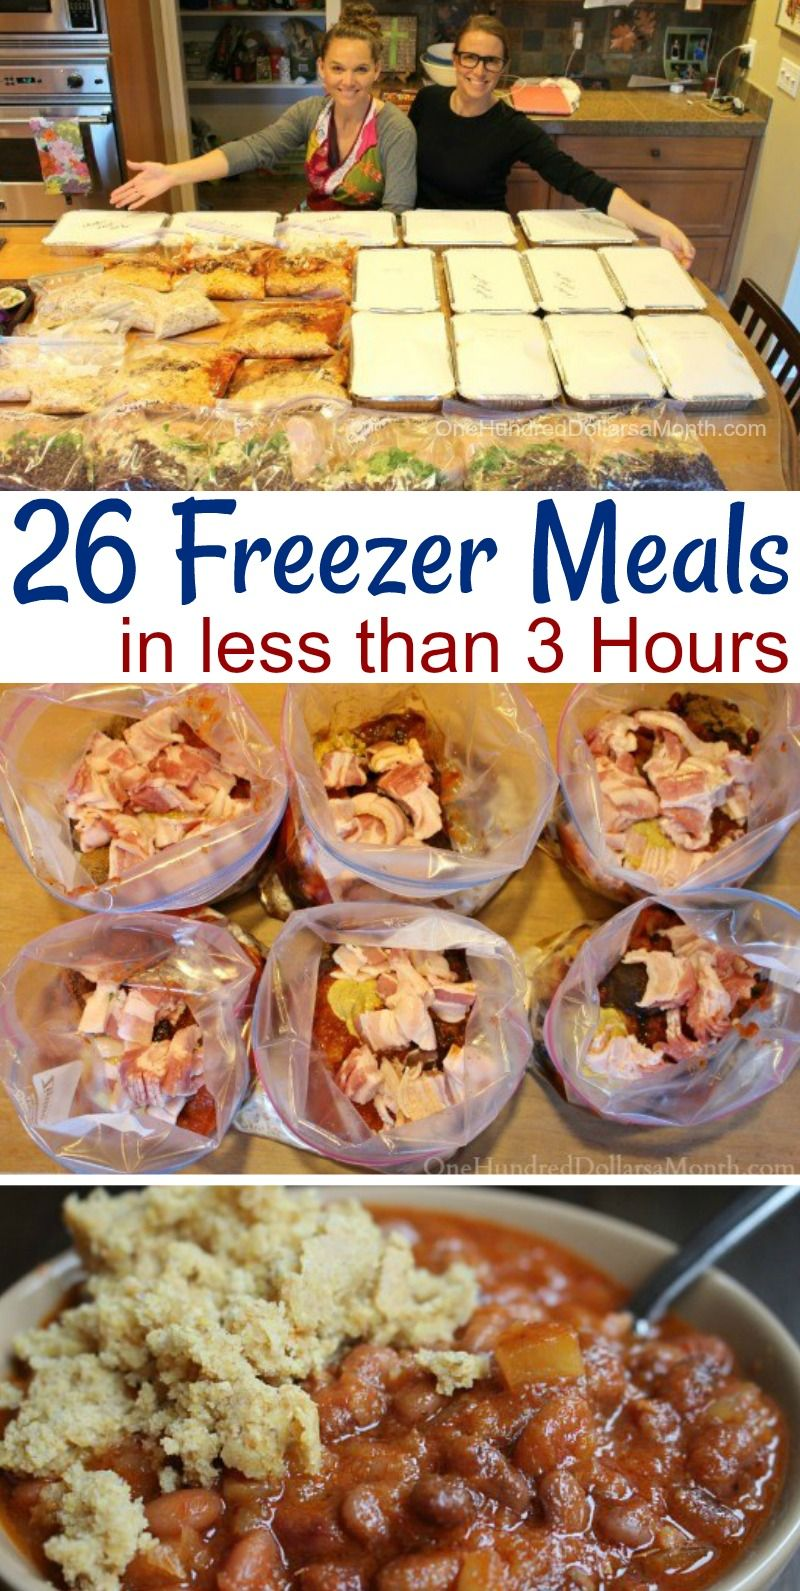 Making 26 Freezer Meals in 3 Hours Freezer meals, Slow